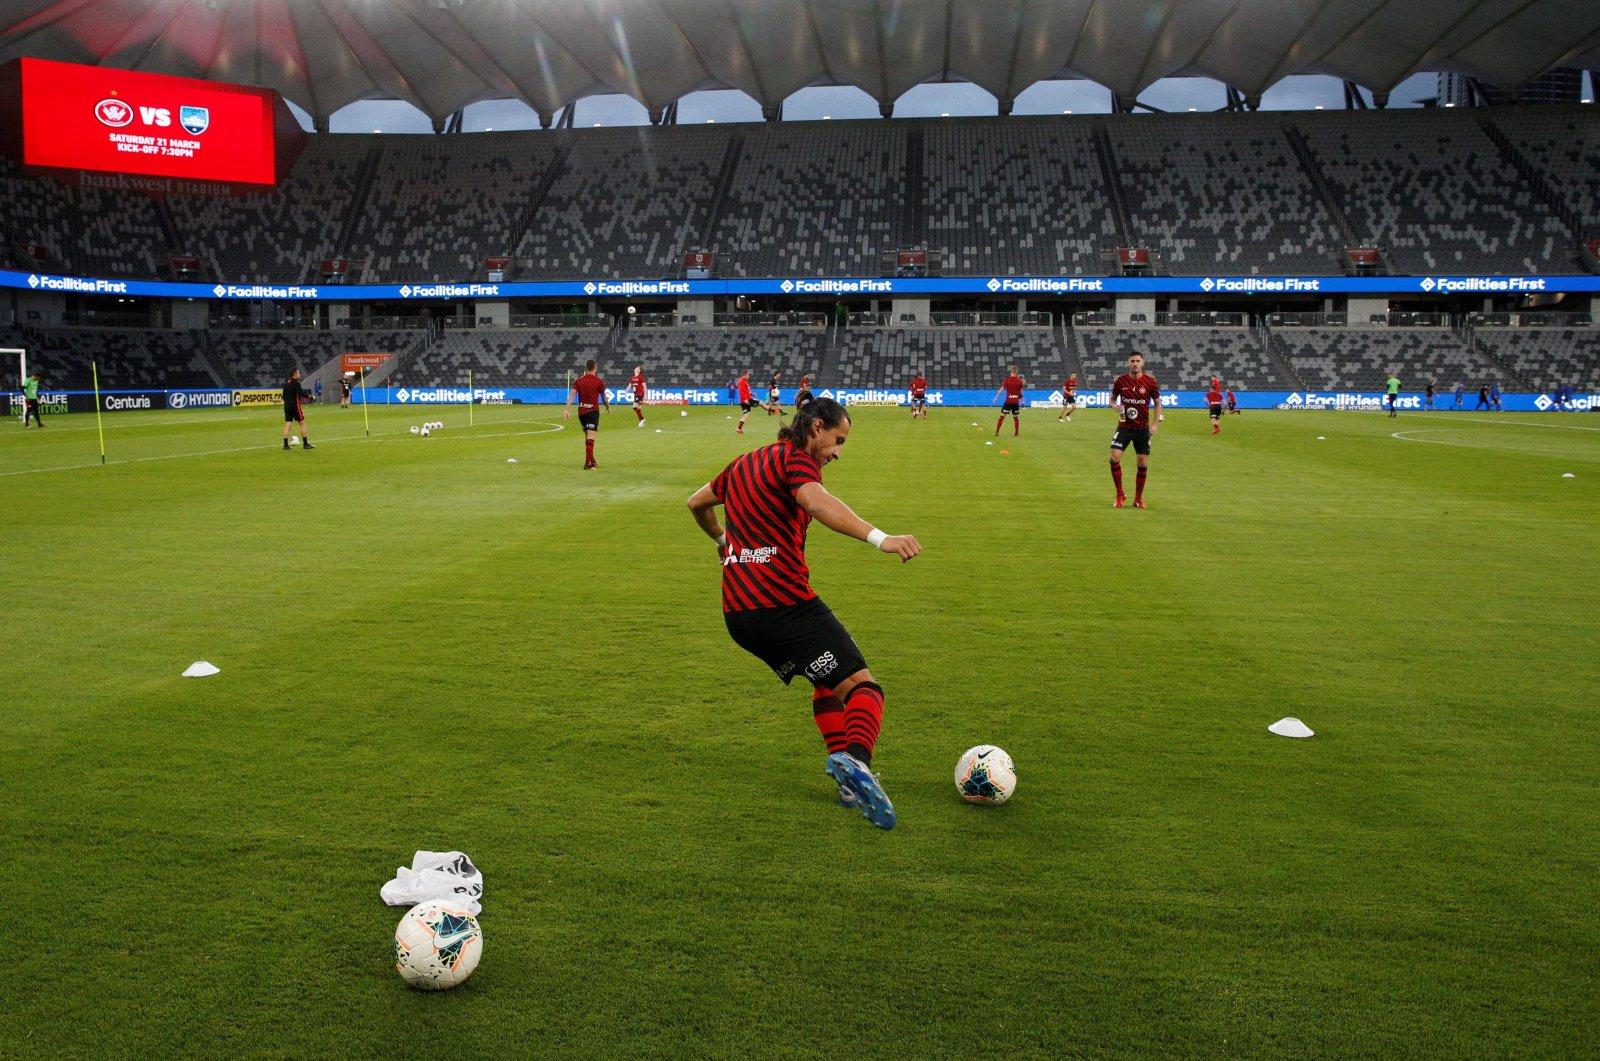 Western Sydney Wanderers' Daniel Georgievski (C) warms up in Bankwest Stadium, Sydney, Australia, March 21, 2020. (AFP Photo)